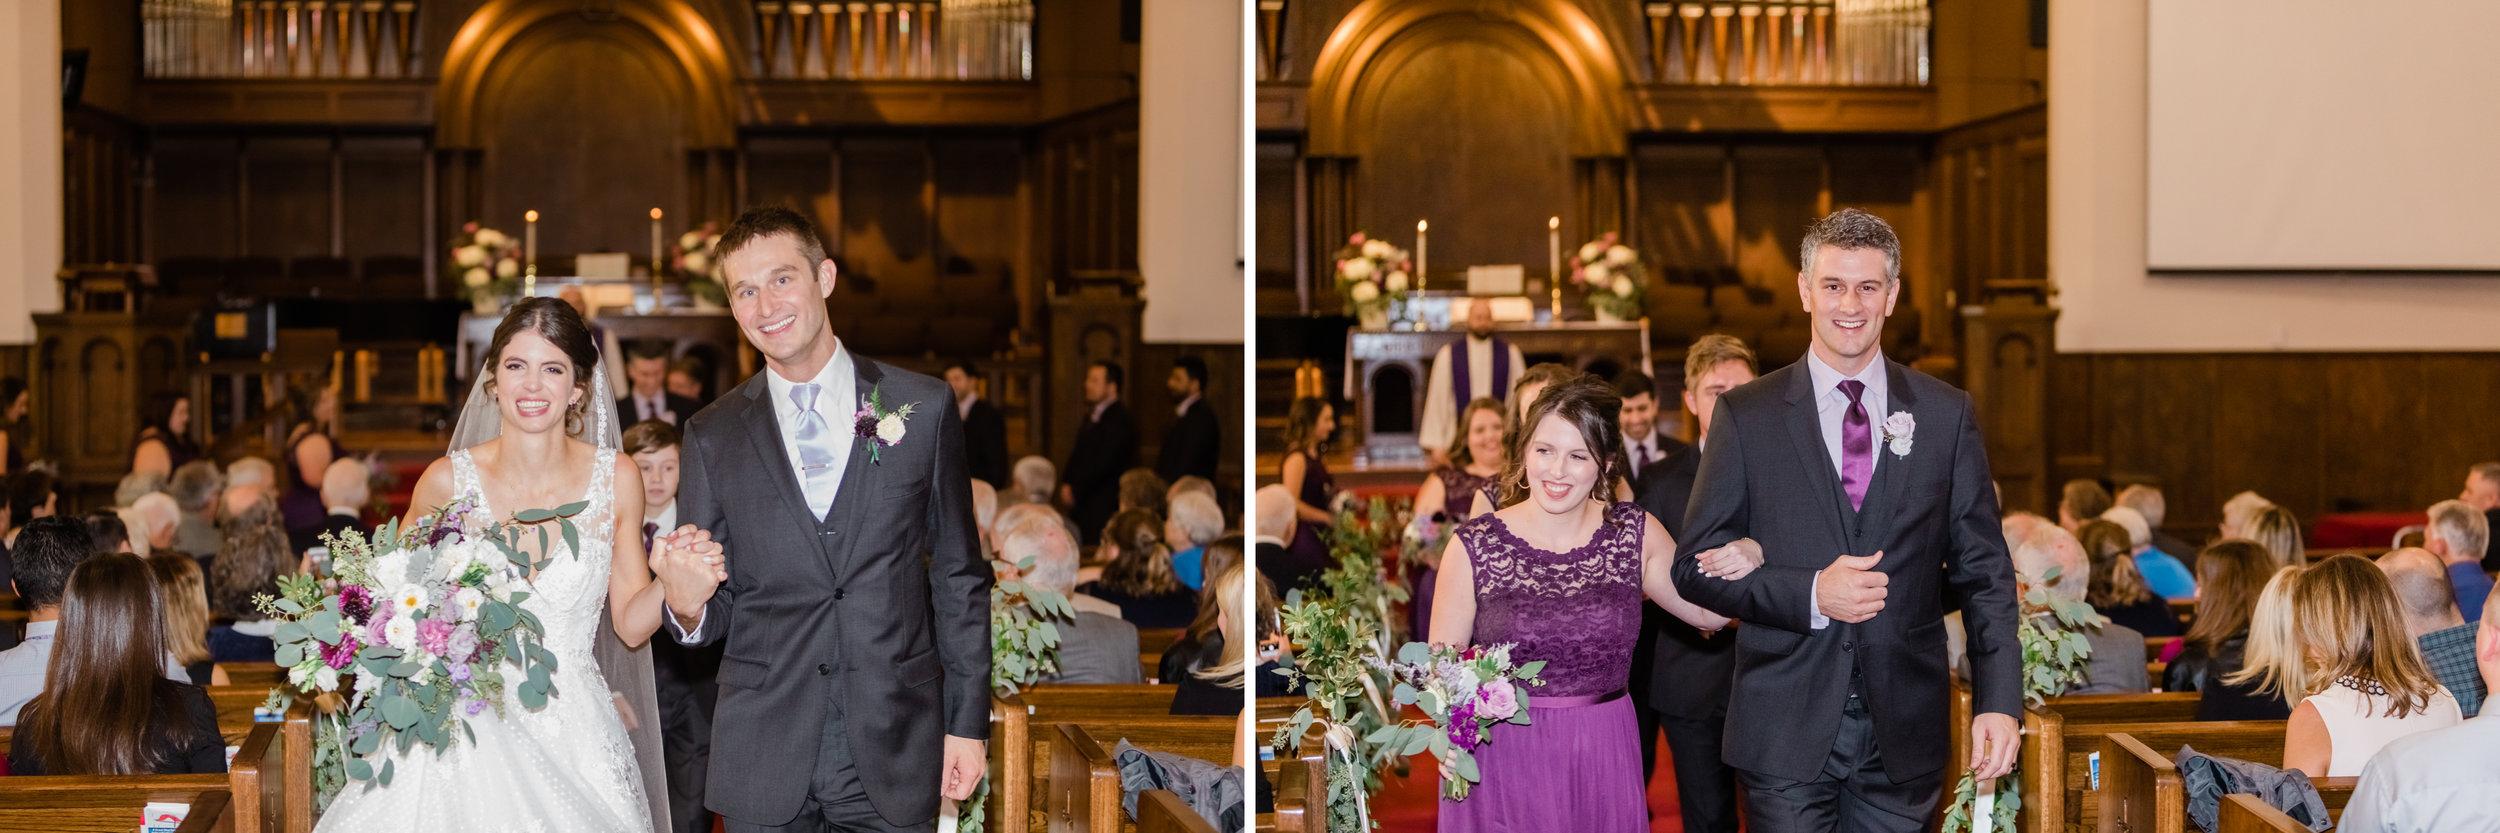 Kansas City wedding photographer11.jpg